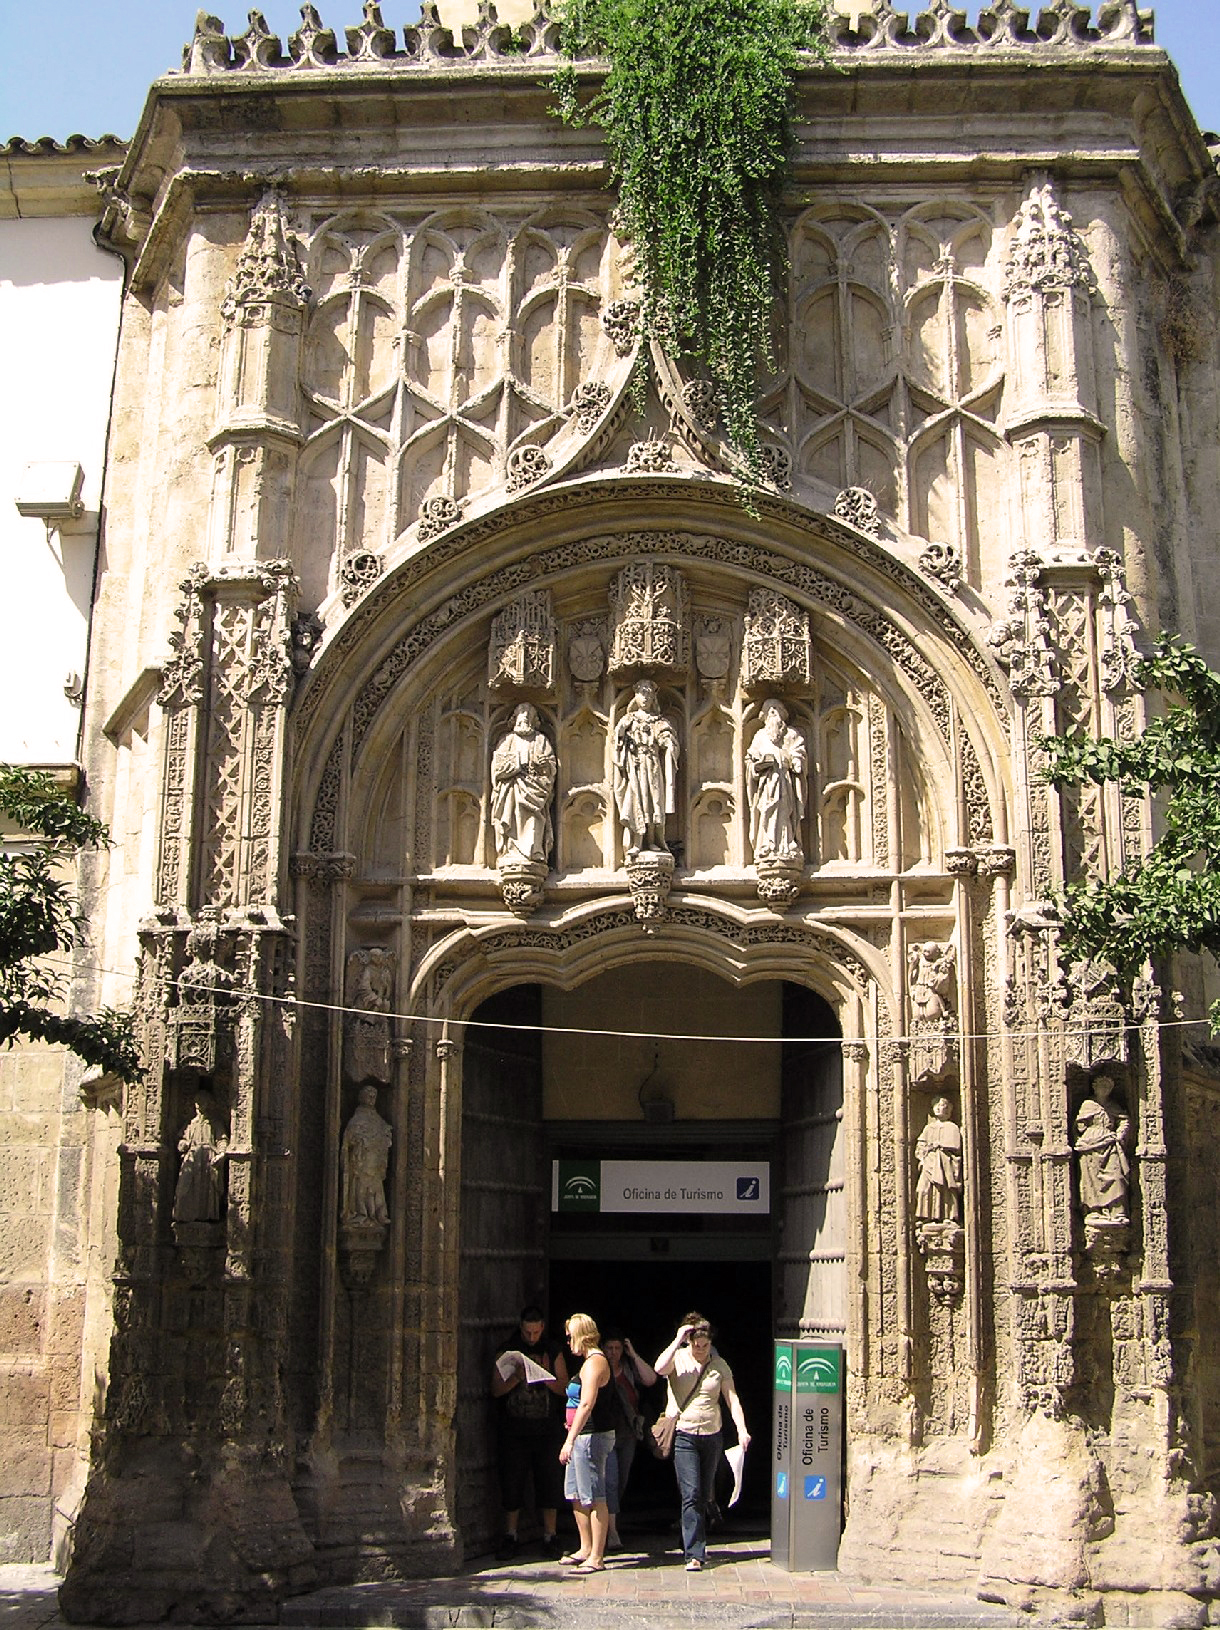 Mezquita catedral de c rdoba portal fuenterrebollo for Oficina de turismo astorga